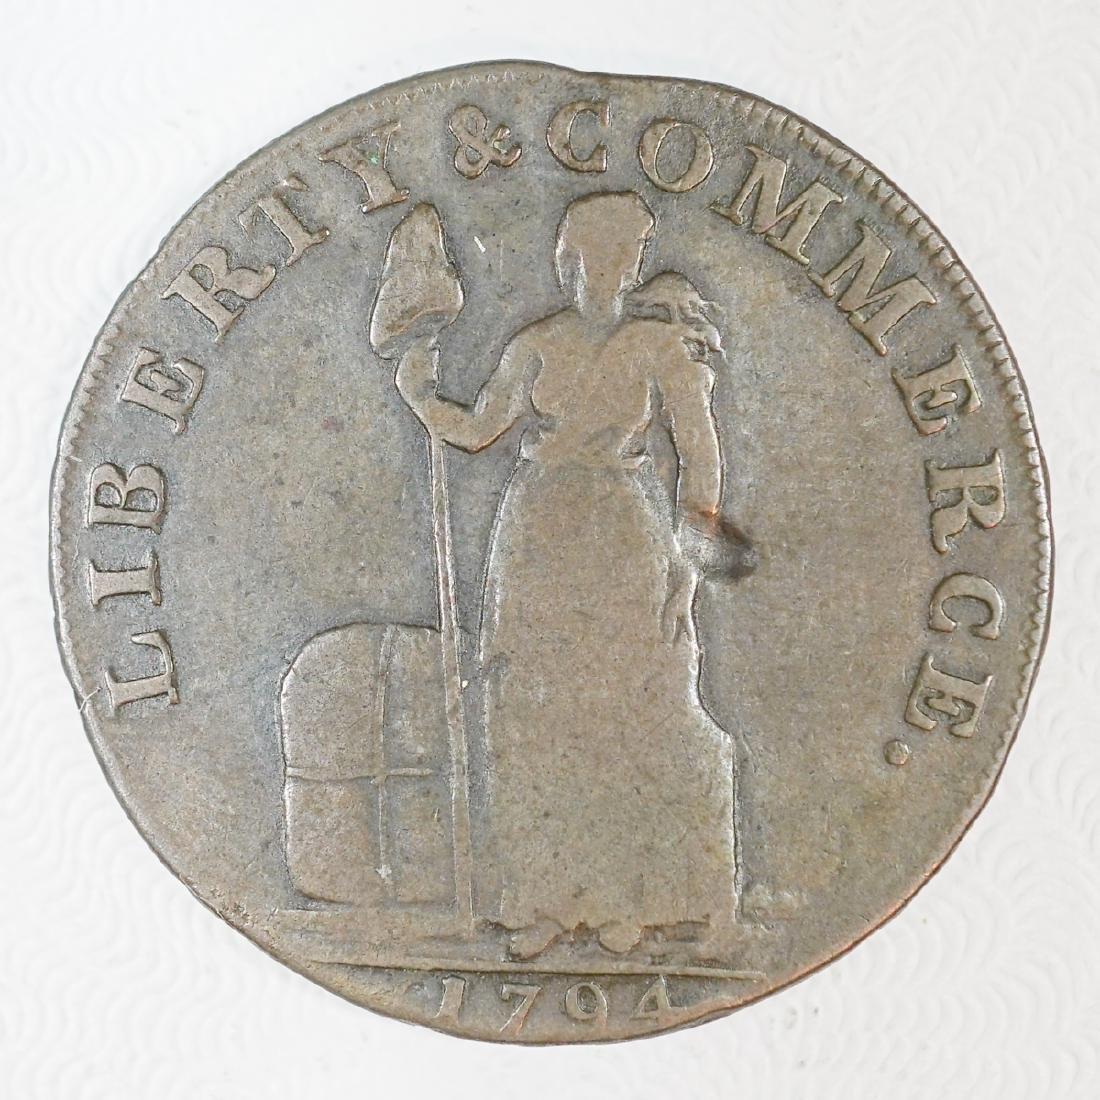 1794 Talbot, Allum & Lee, One Cent, New York